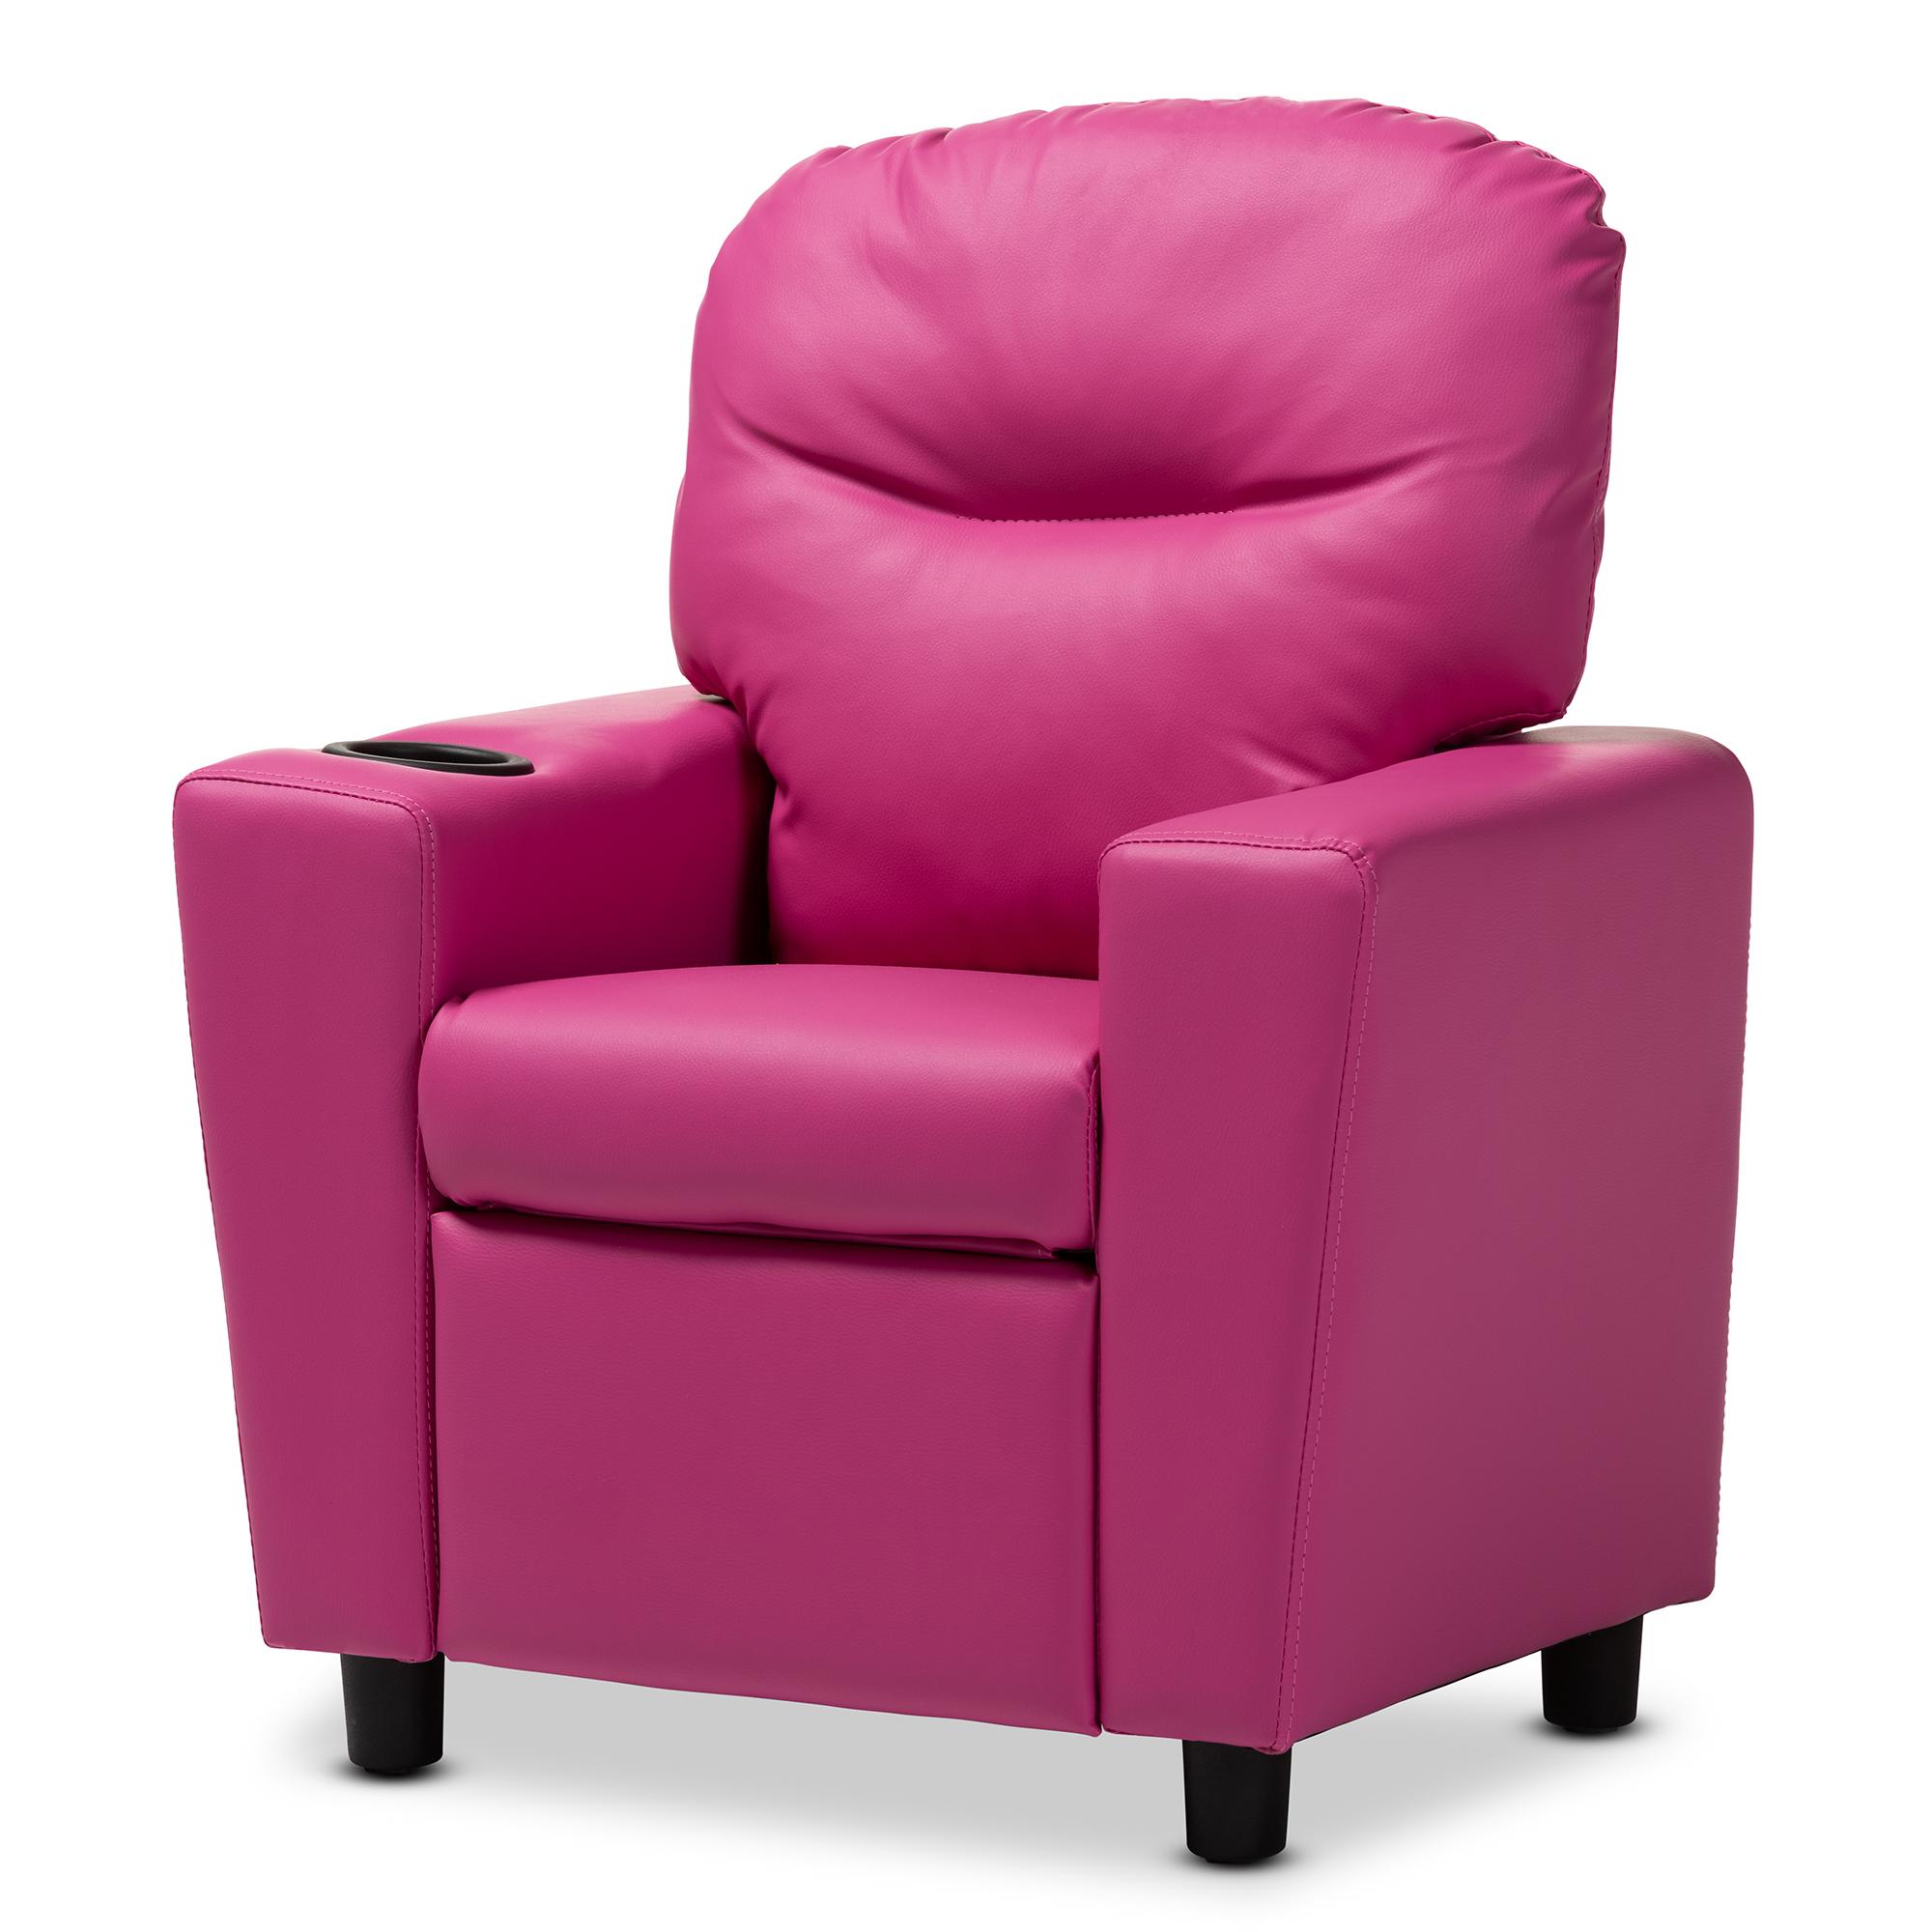 Excellent Baxton Studio Evonka Modern And Contemporary Magenta Pink Creativecarmelina Interior Chair Design Creativecarmelinacom